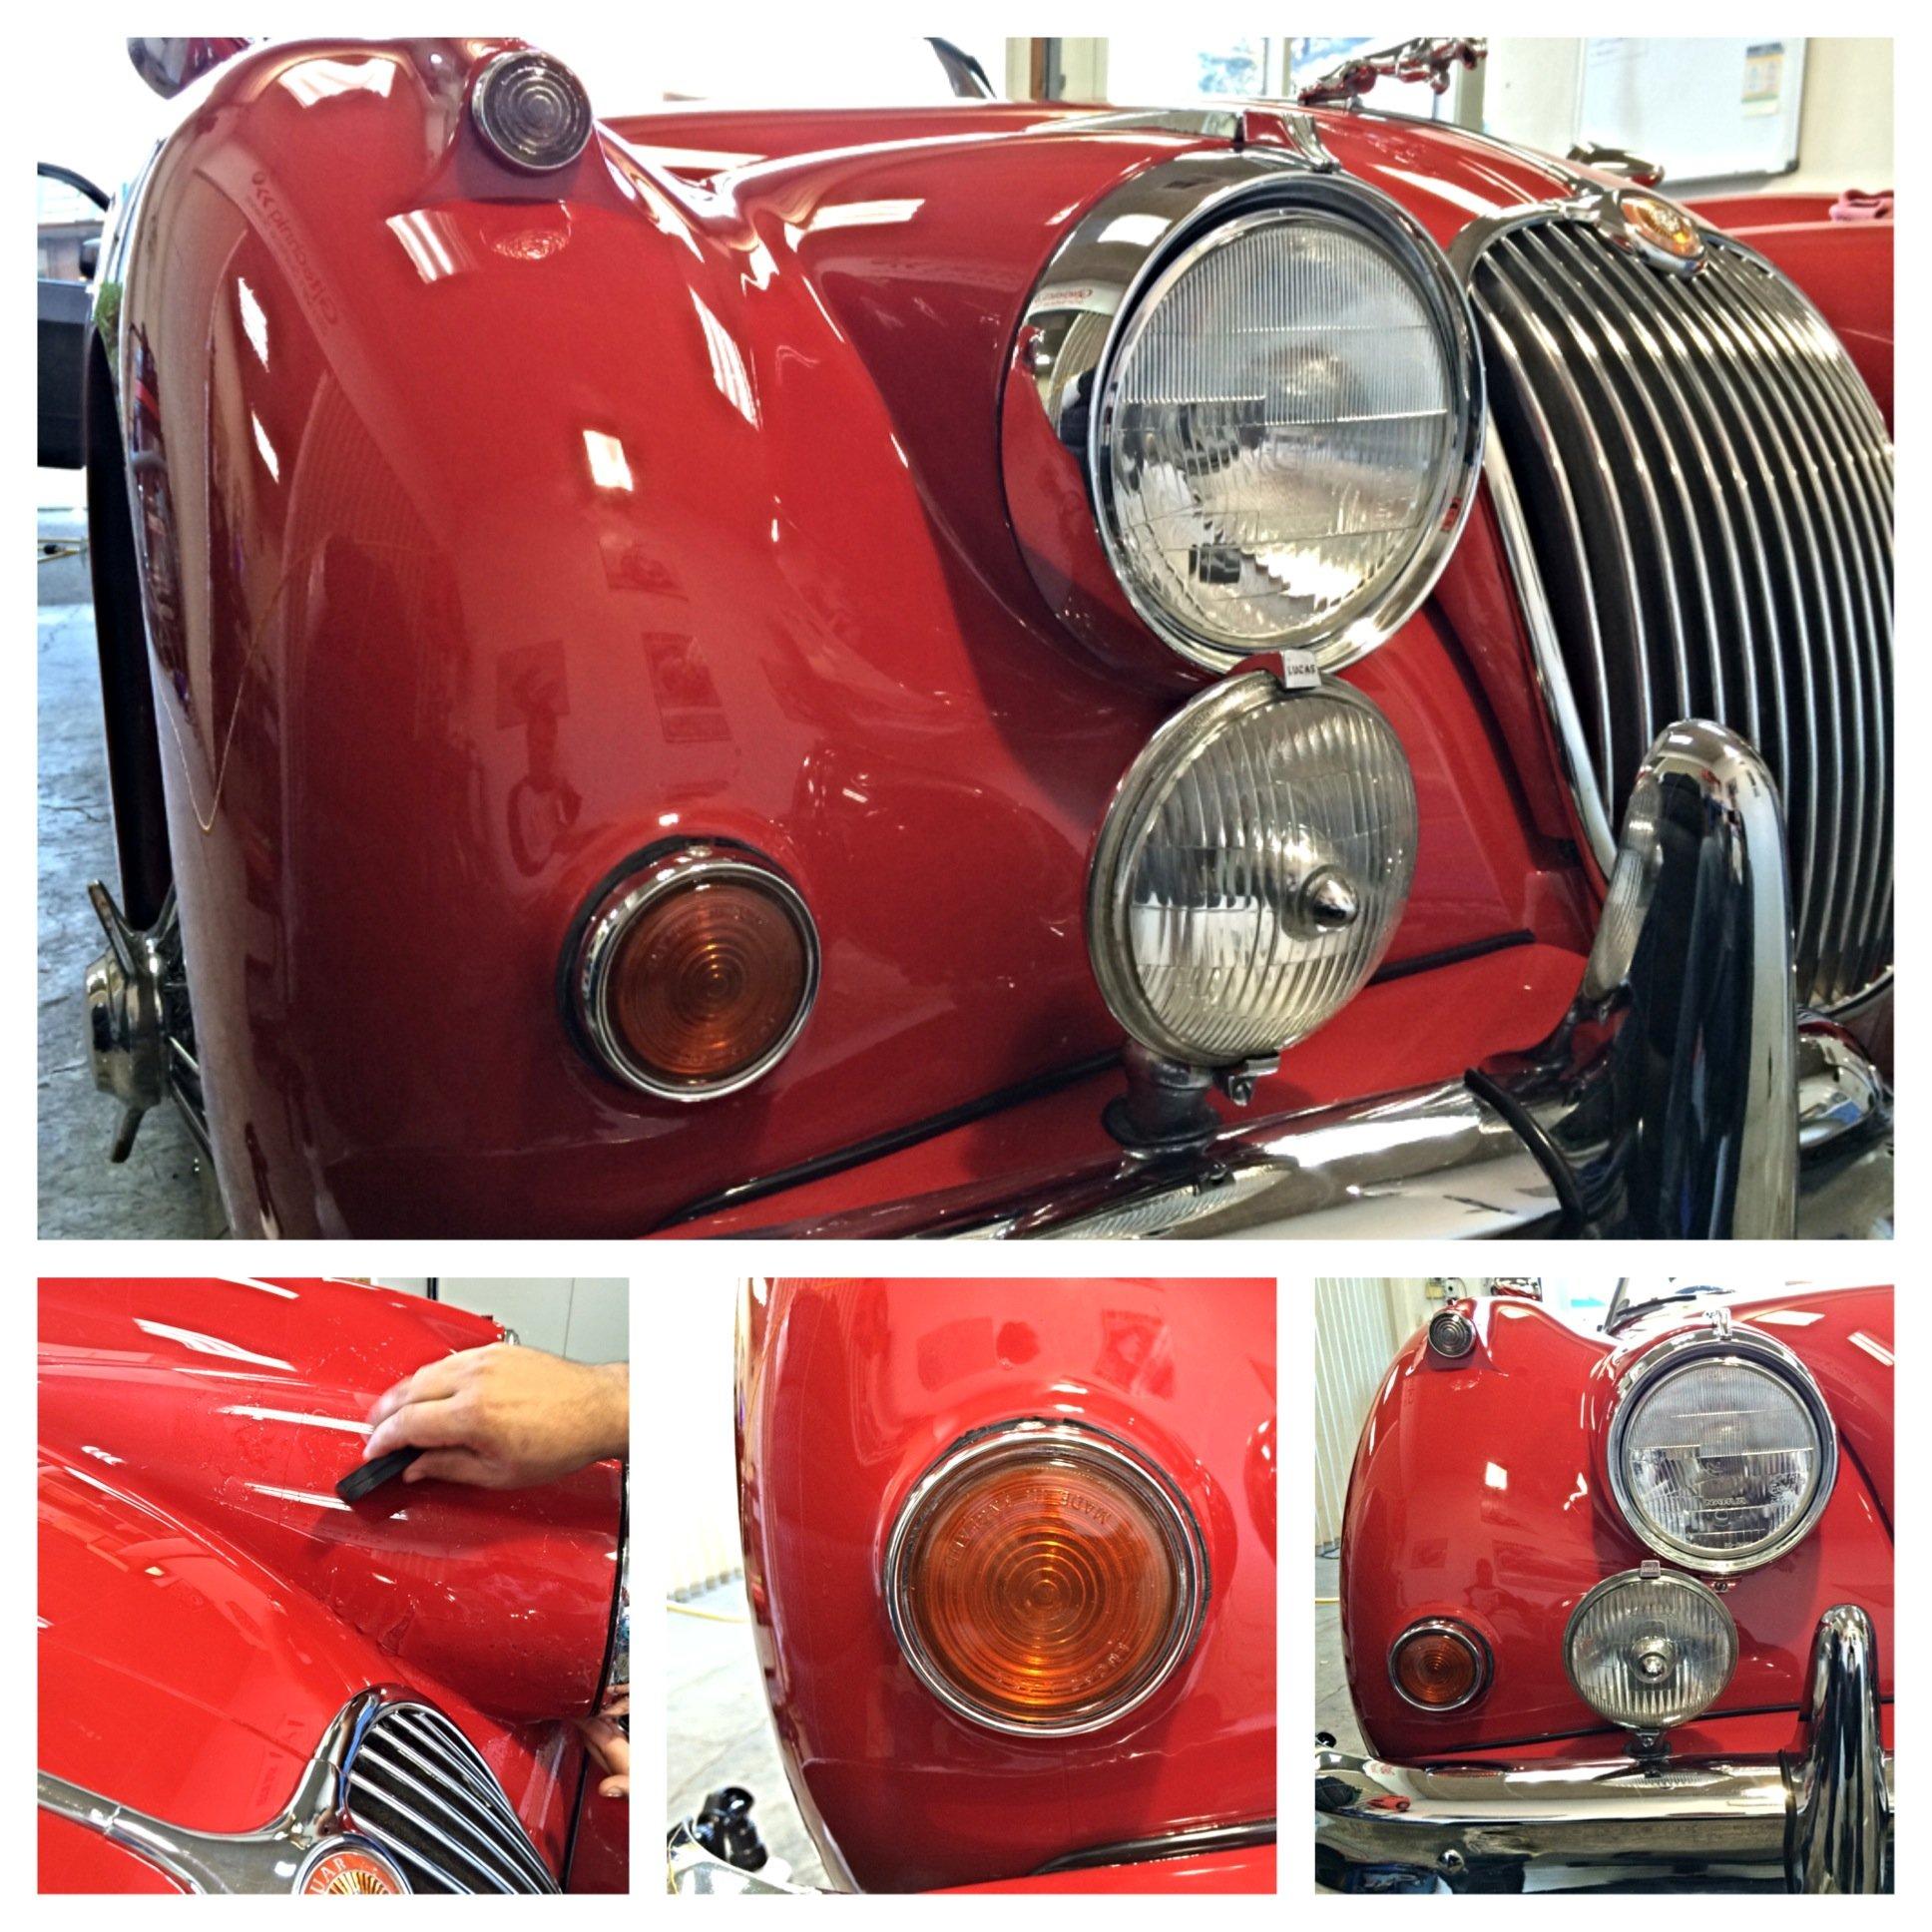 MK10, classic car, hand template, TARGA, racing, team jaguar, customised, car bra, stone chip film, paint protection film, winguard, adelaide, matte paint, adelaide, matt paint, decal, tint, XPEL, Ultimate, Stealth